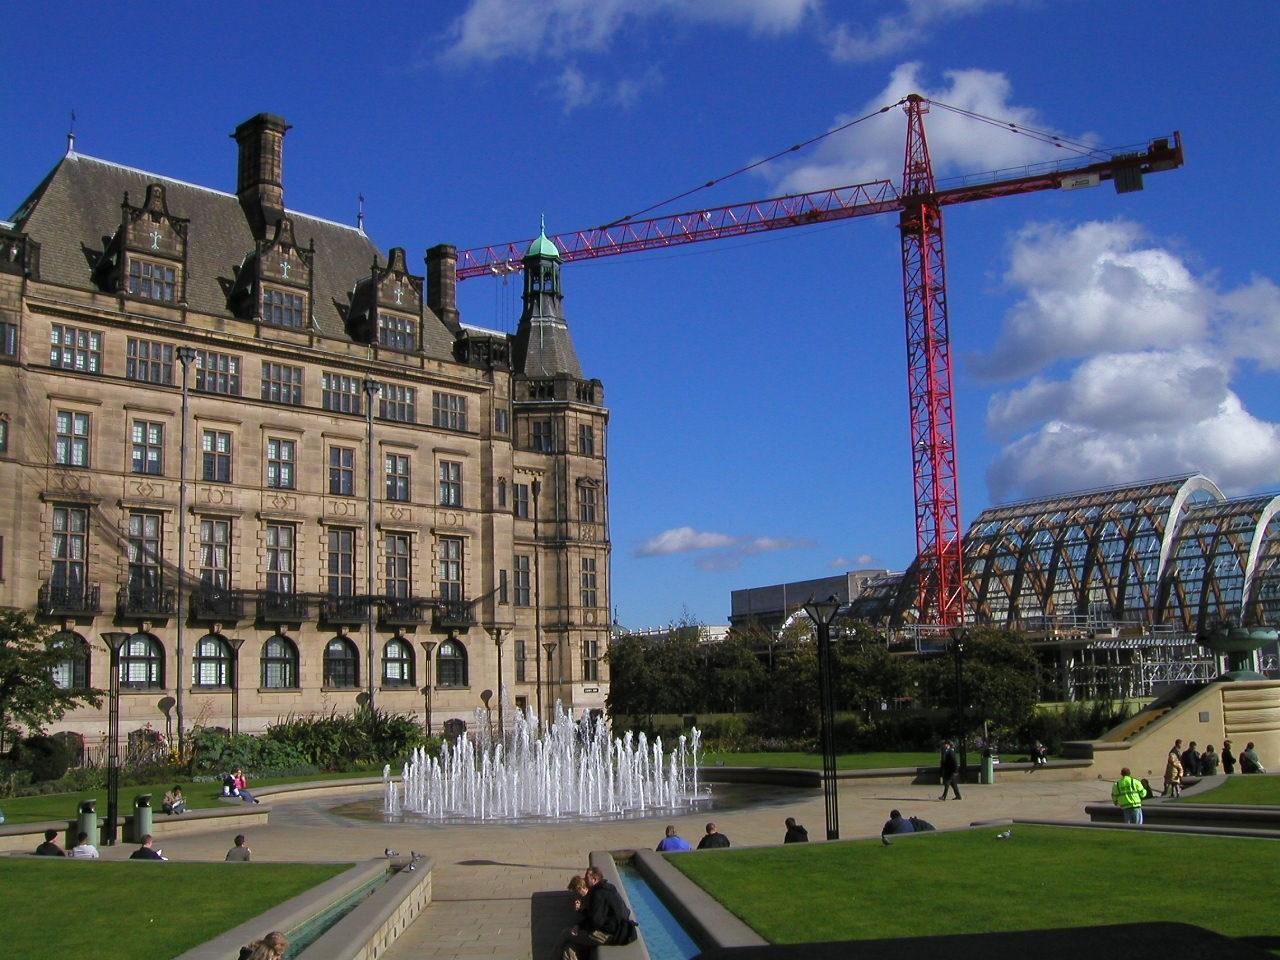 SheffieldGardens.jpg